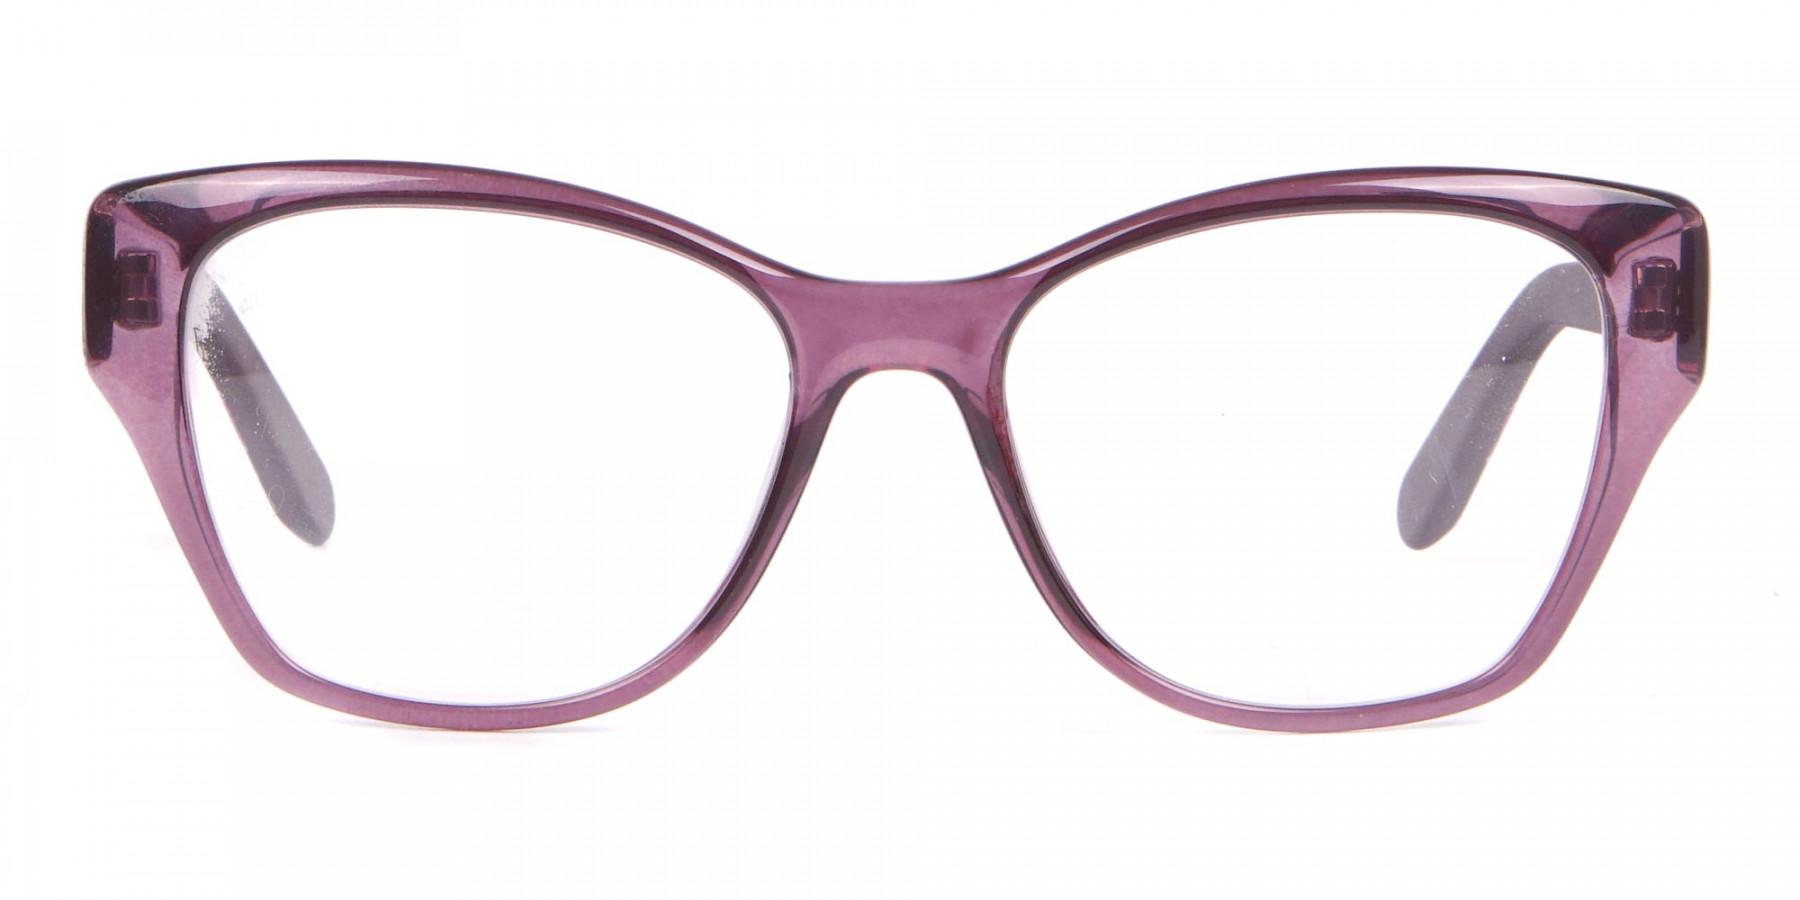 Salvatore Ferragamo SF2827 Cateye Wayfarer Glasses Purple-1